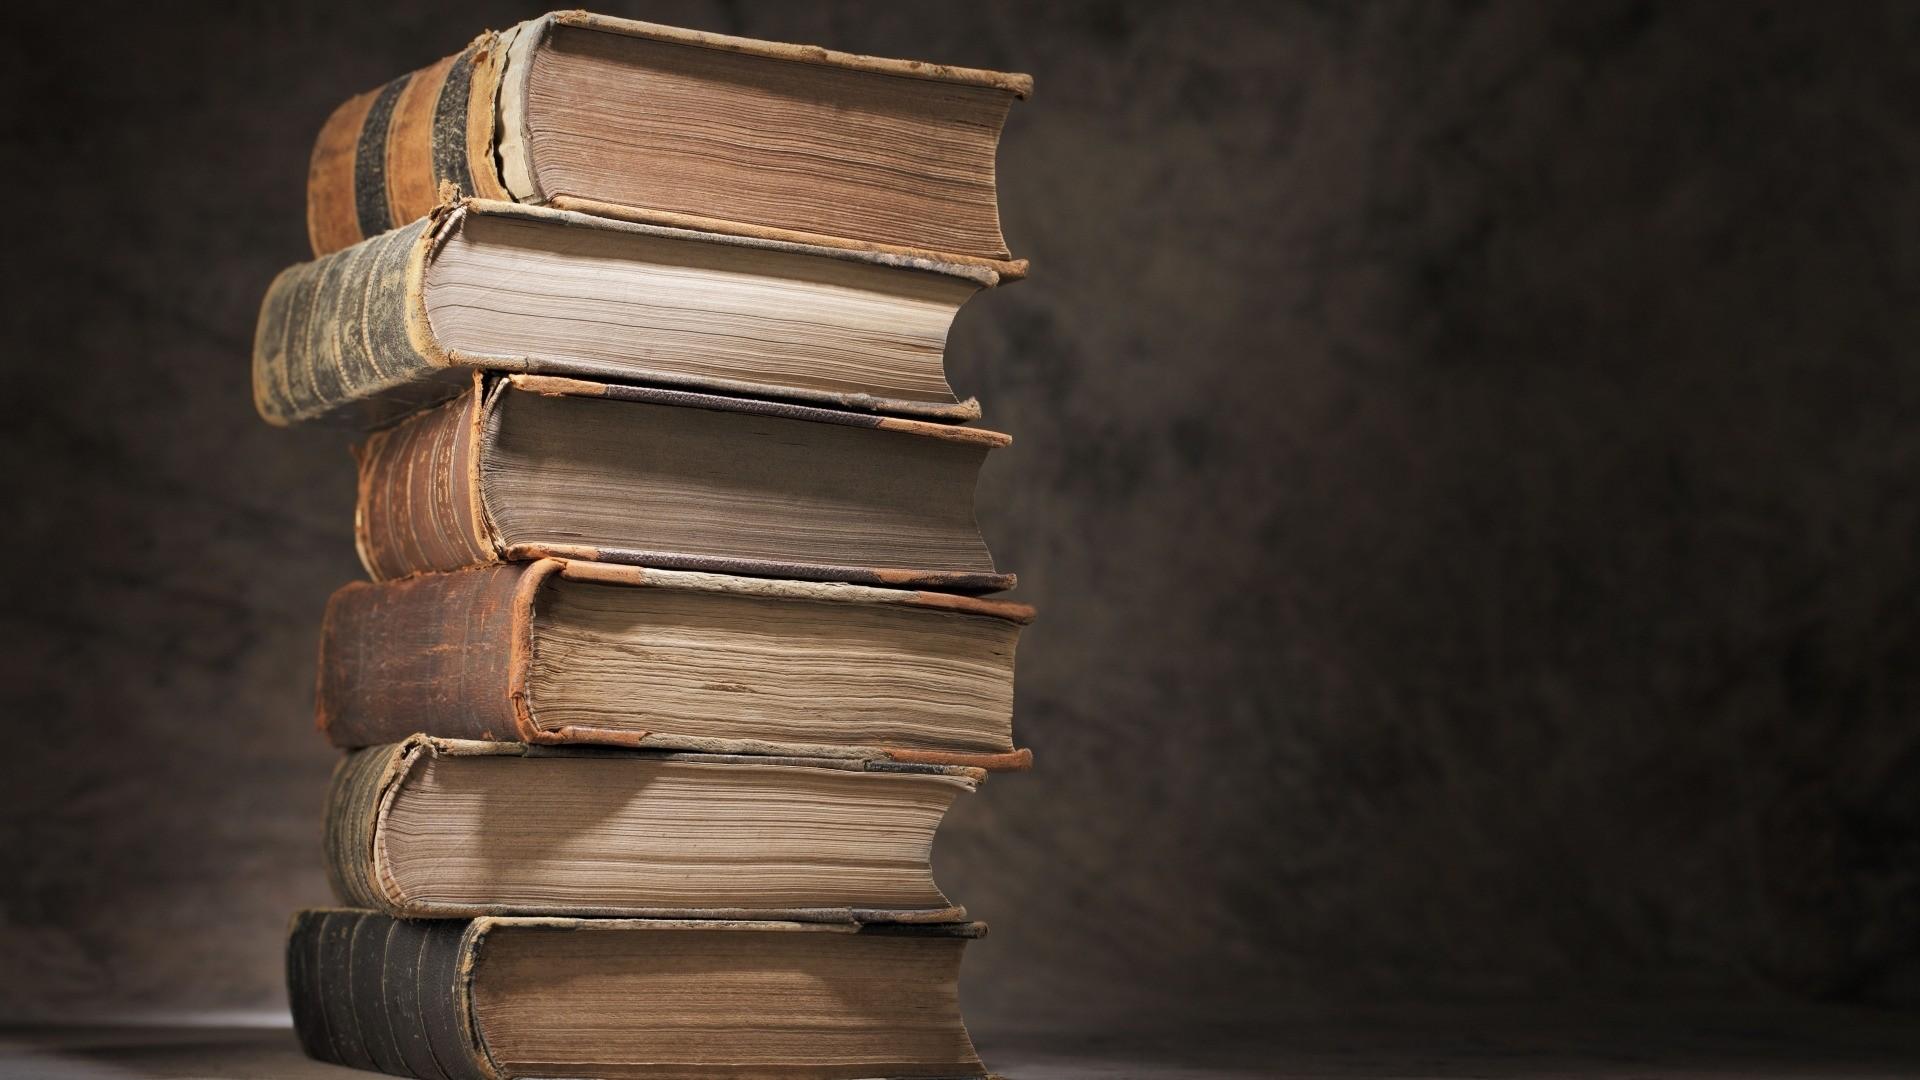 Books hd desktop wallpaper